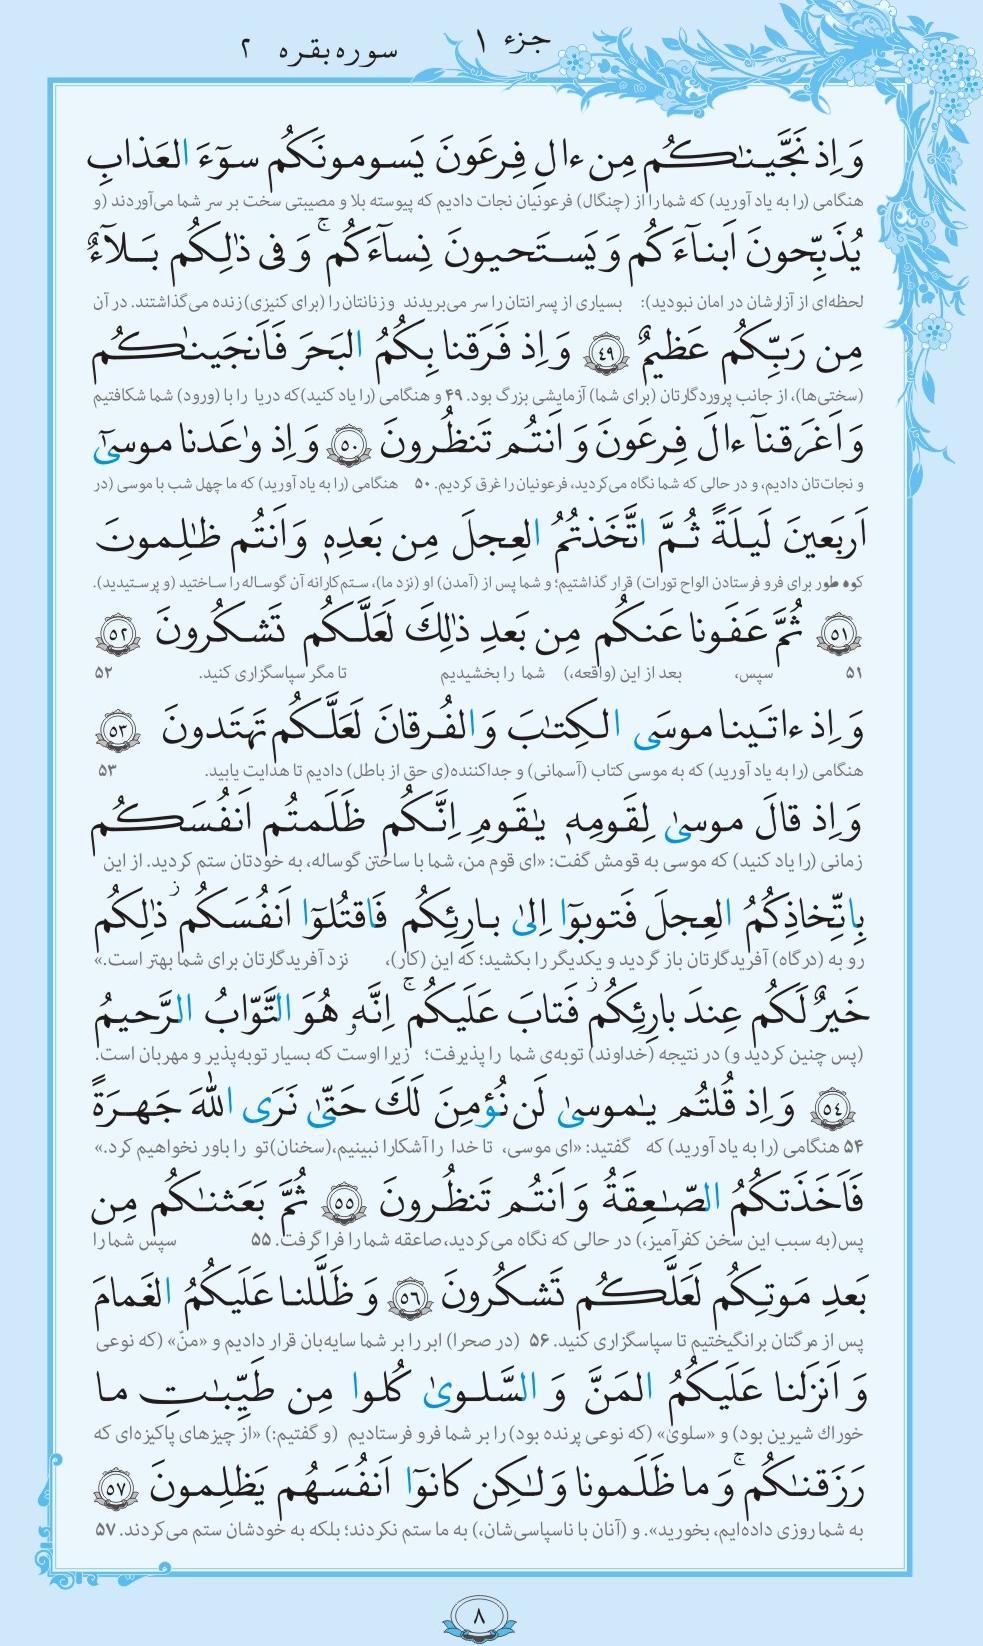 13991101000664 Test NewPhotoFree - ترتیل صفحه ۸ قرآن کریم+فیلم، متن و مفاهیم آیات